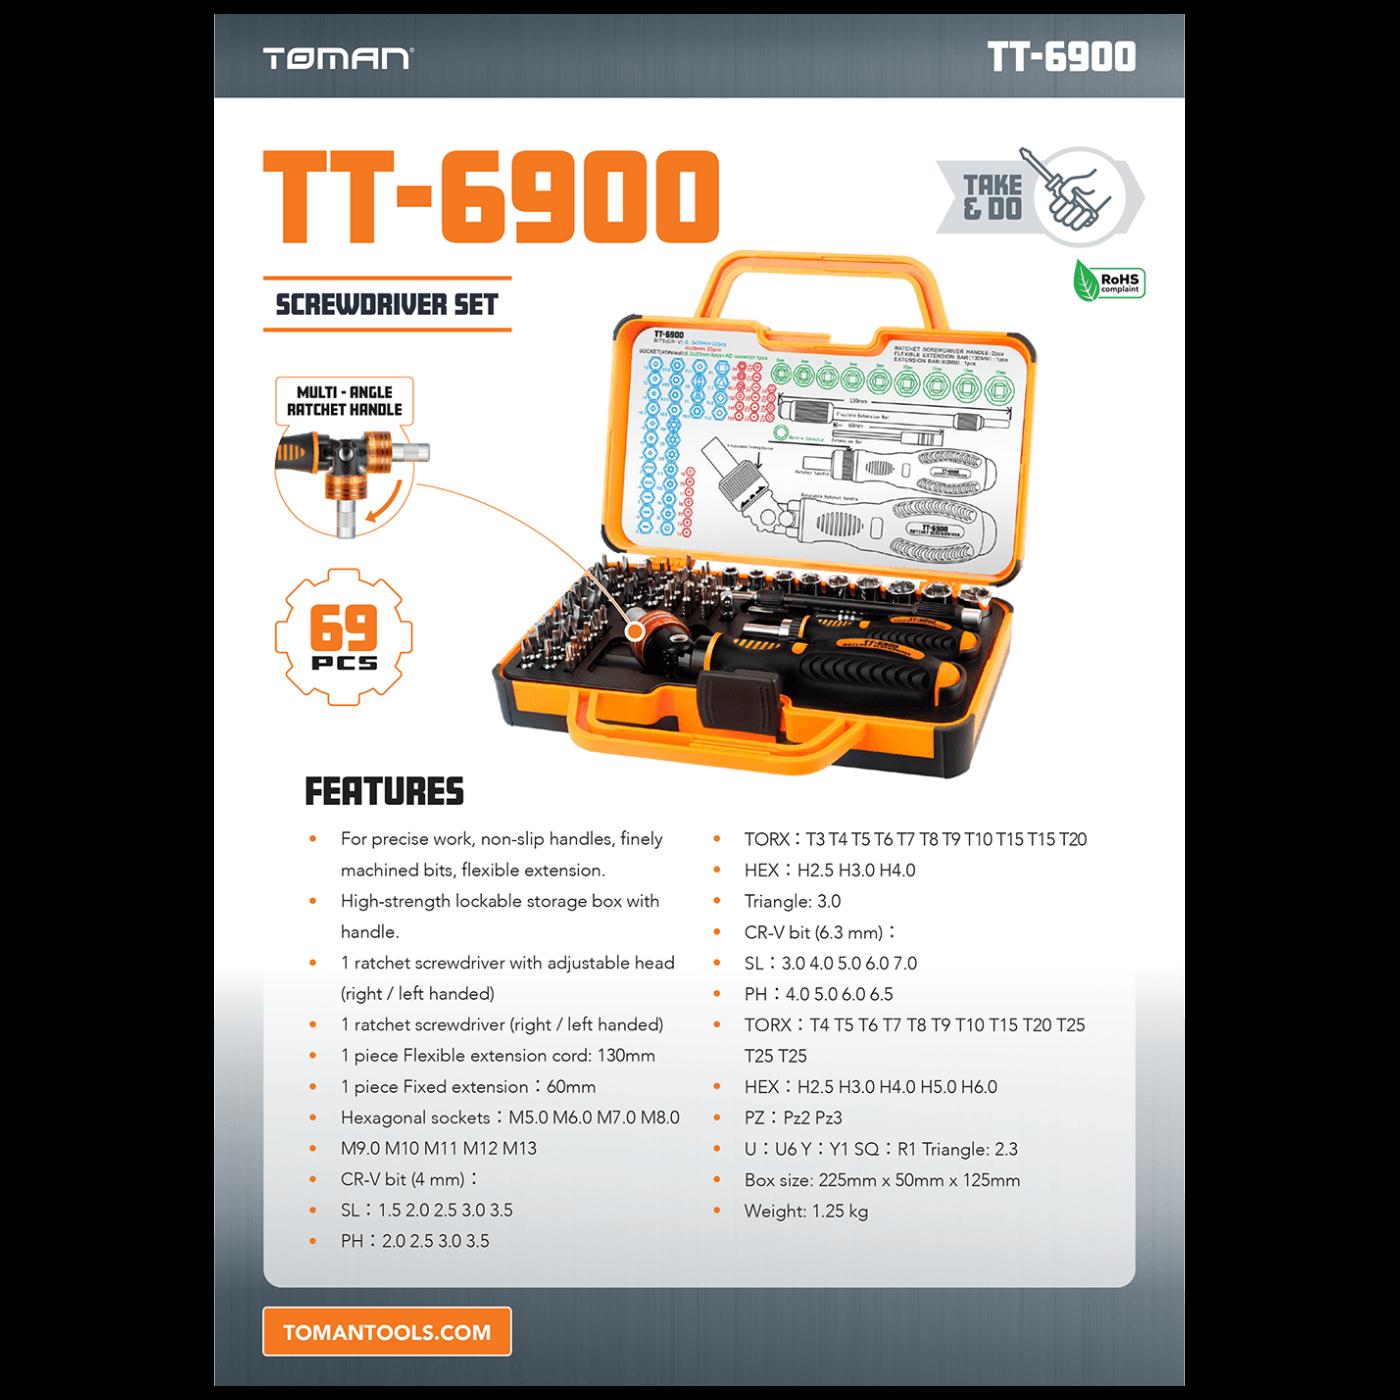 TT6900